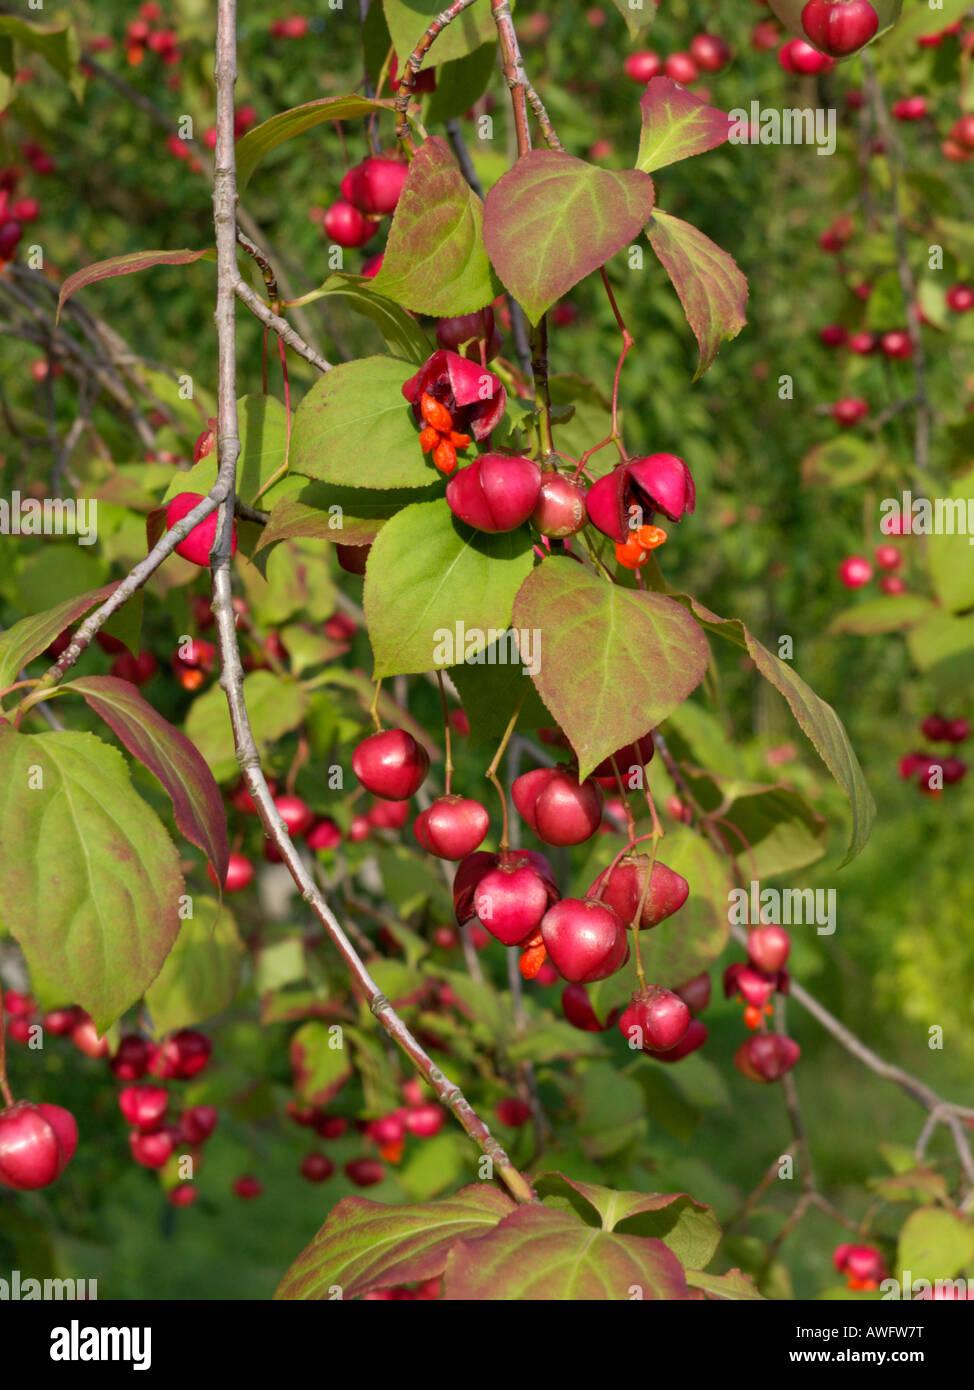 Dingle dangle tree (Euonymus planipes) - Stock Image